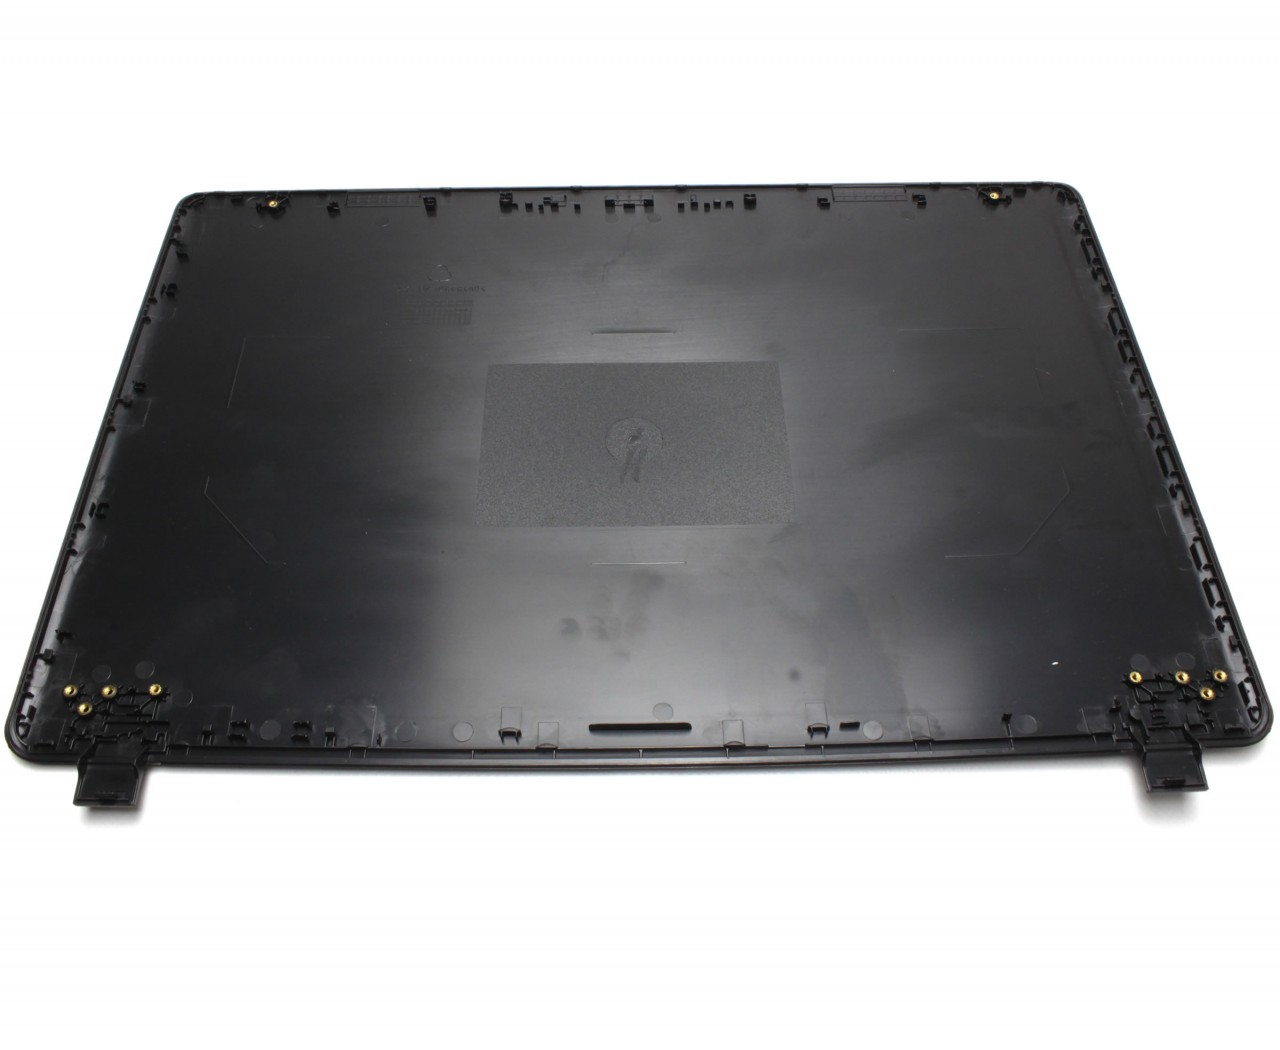 Capac Display BackCover Acer Aspire ES1-533 Carcasa Display imagine powerlaptop.ro 2021